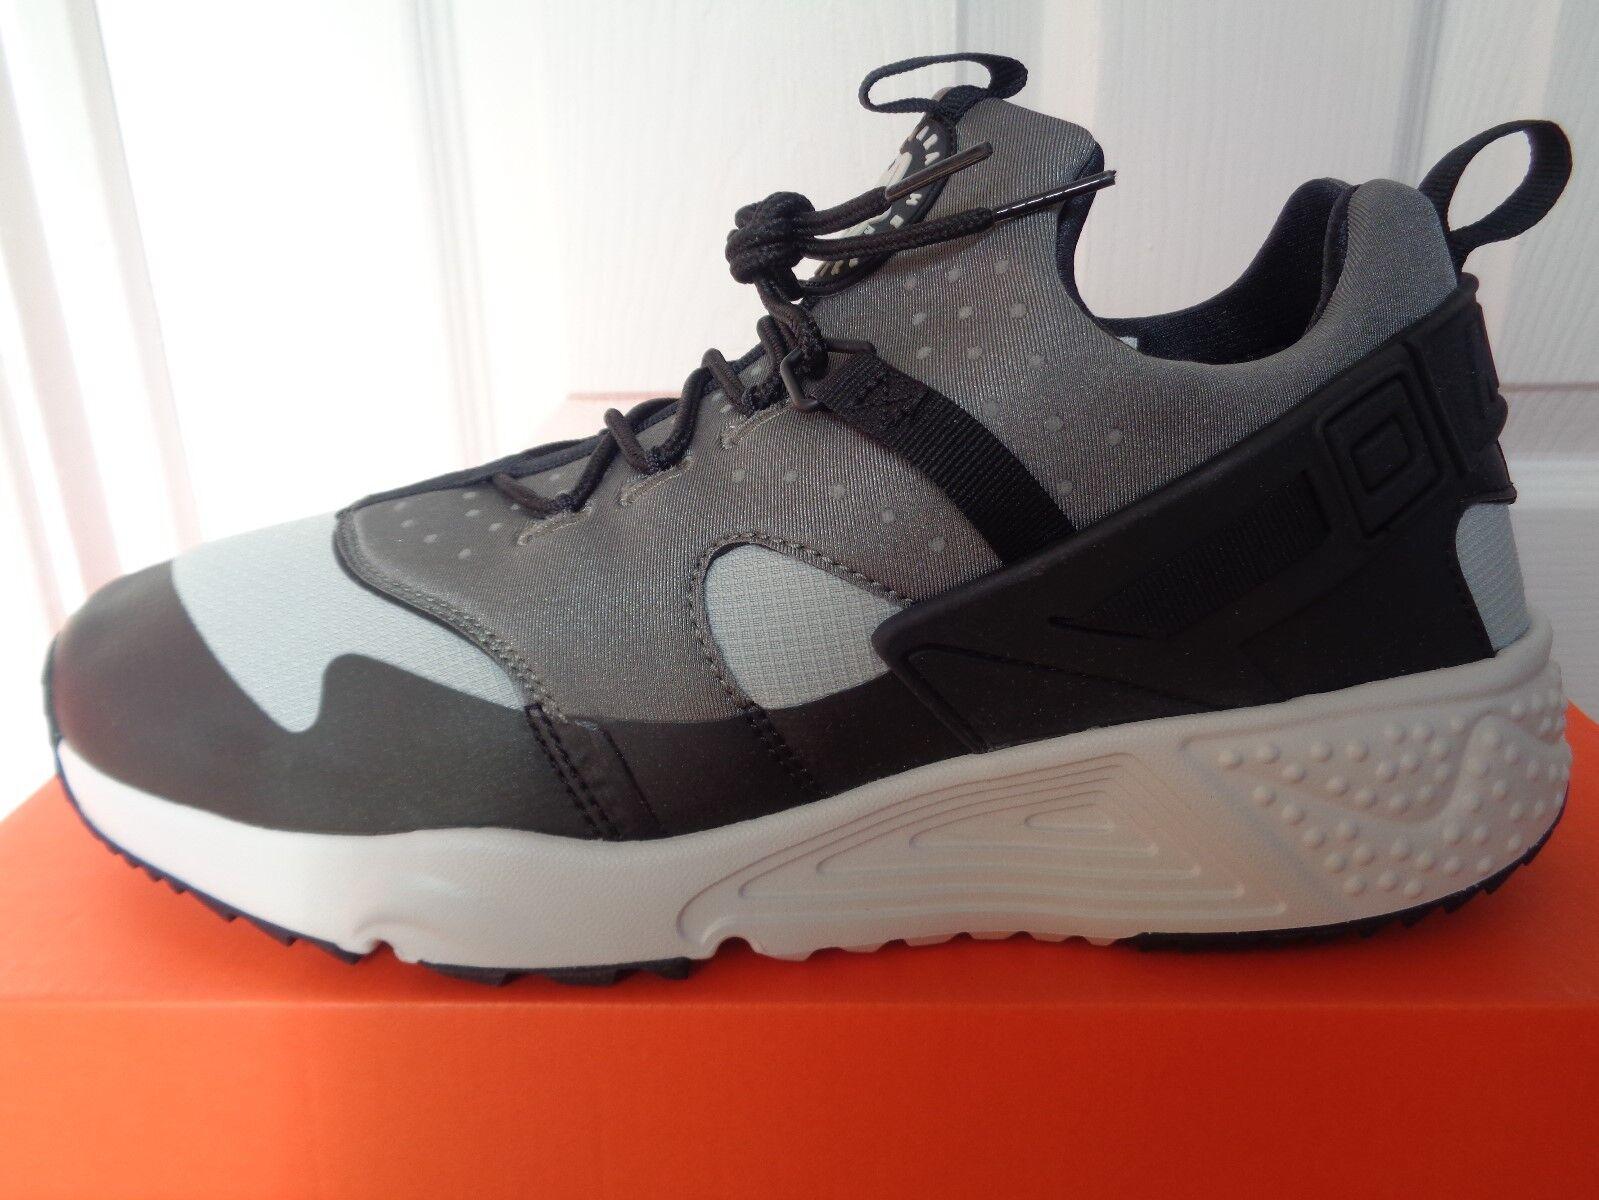 Nike Air Huarache utility trainers Turnschuhe 806807 003 uk 11 eu 46 us 12 NEW+BOX